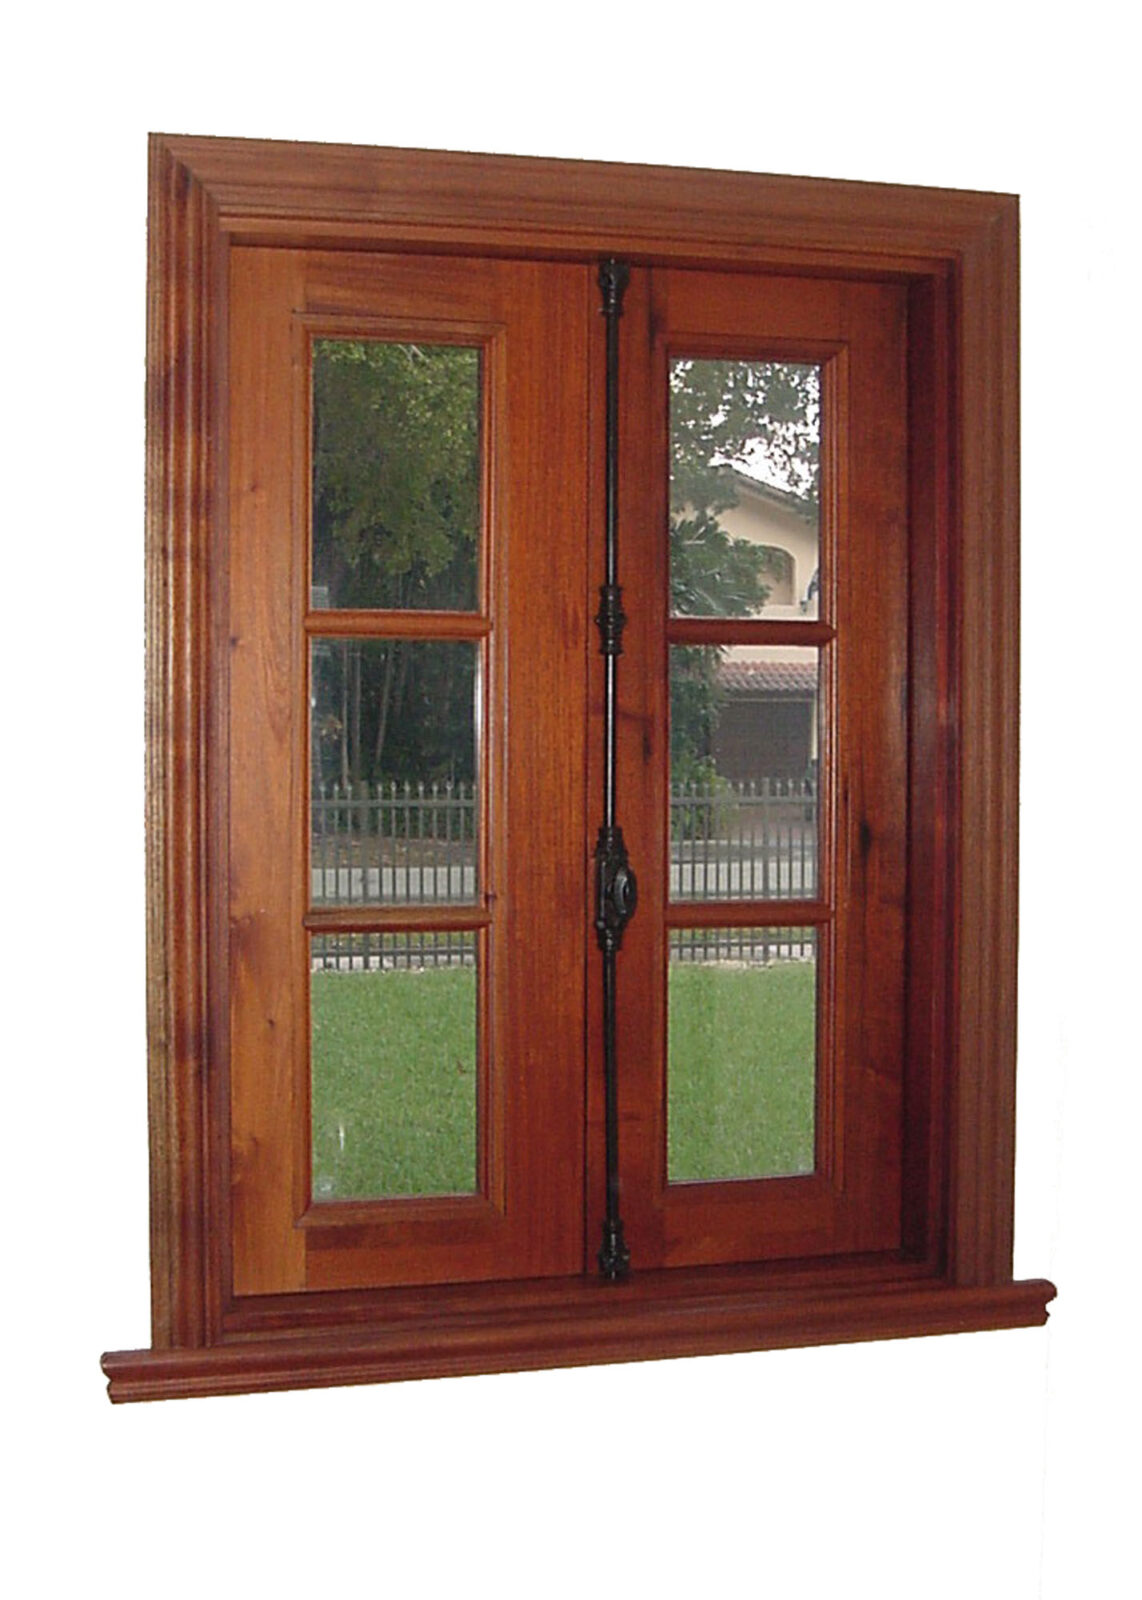 GRANADA MAHOGANY CASEMENT WINDOW